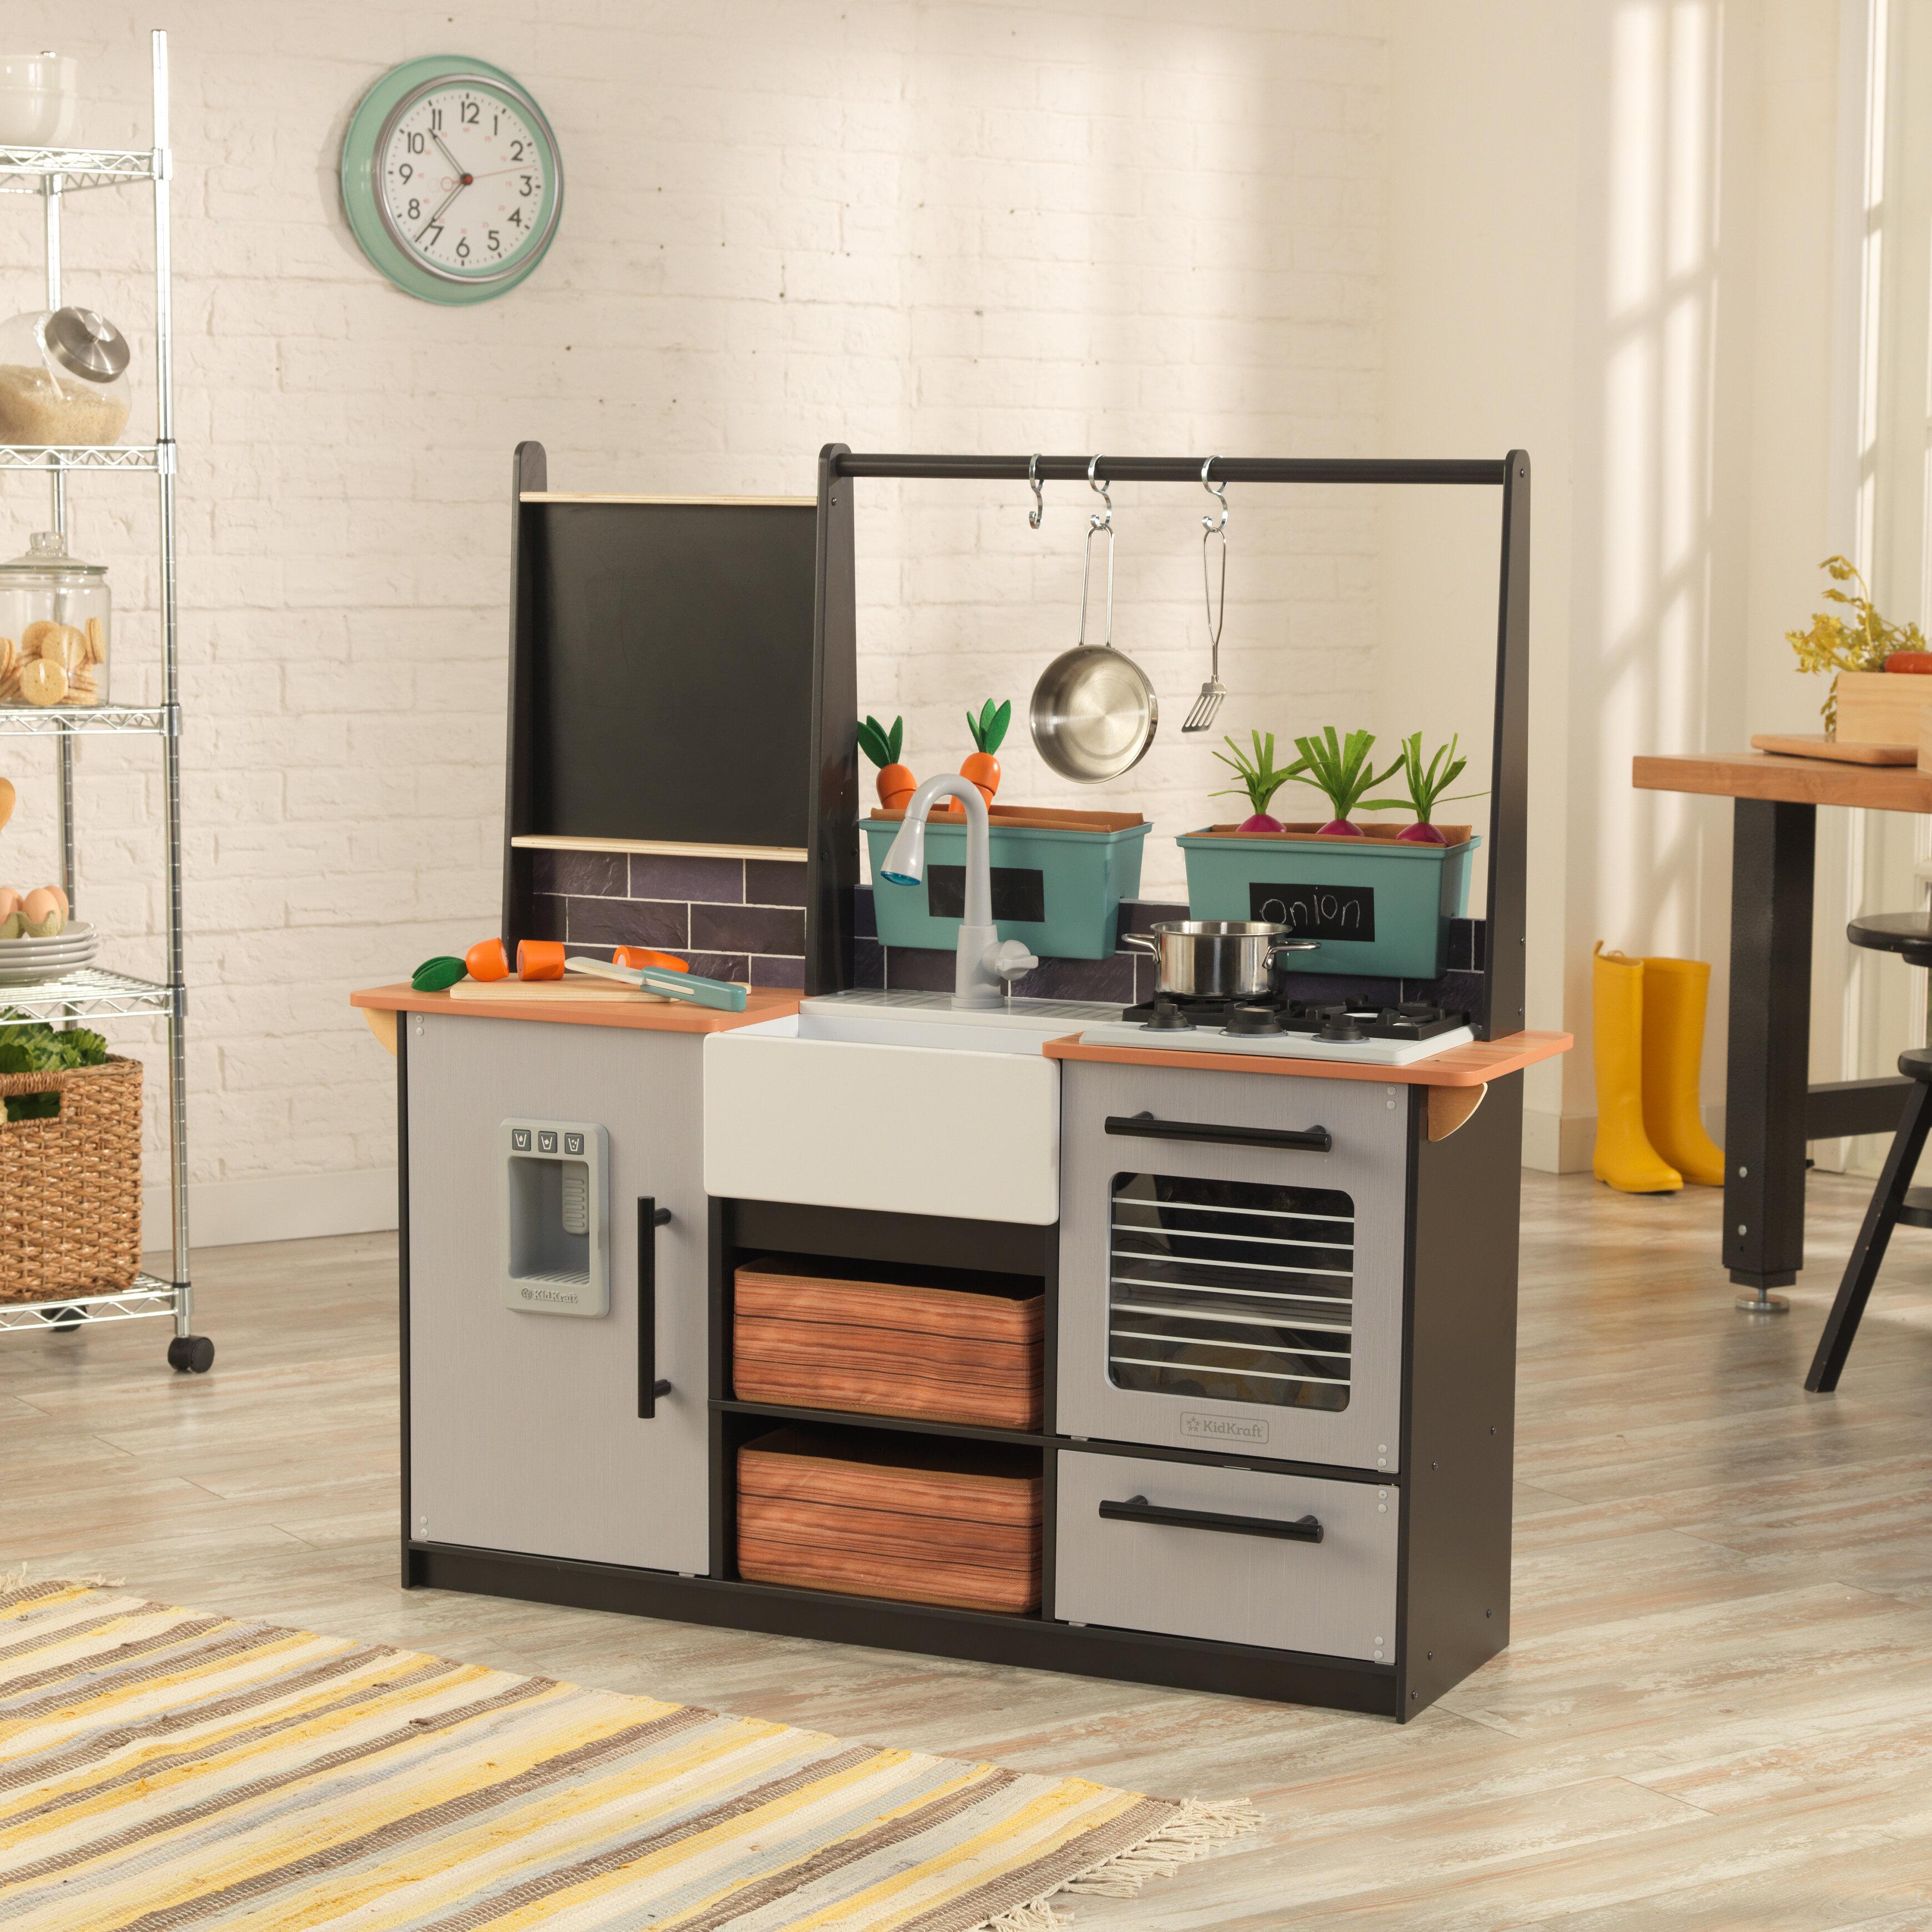 Kidkraft farm to table play kitchen set reviews wayfair ca